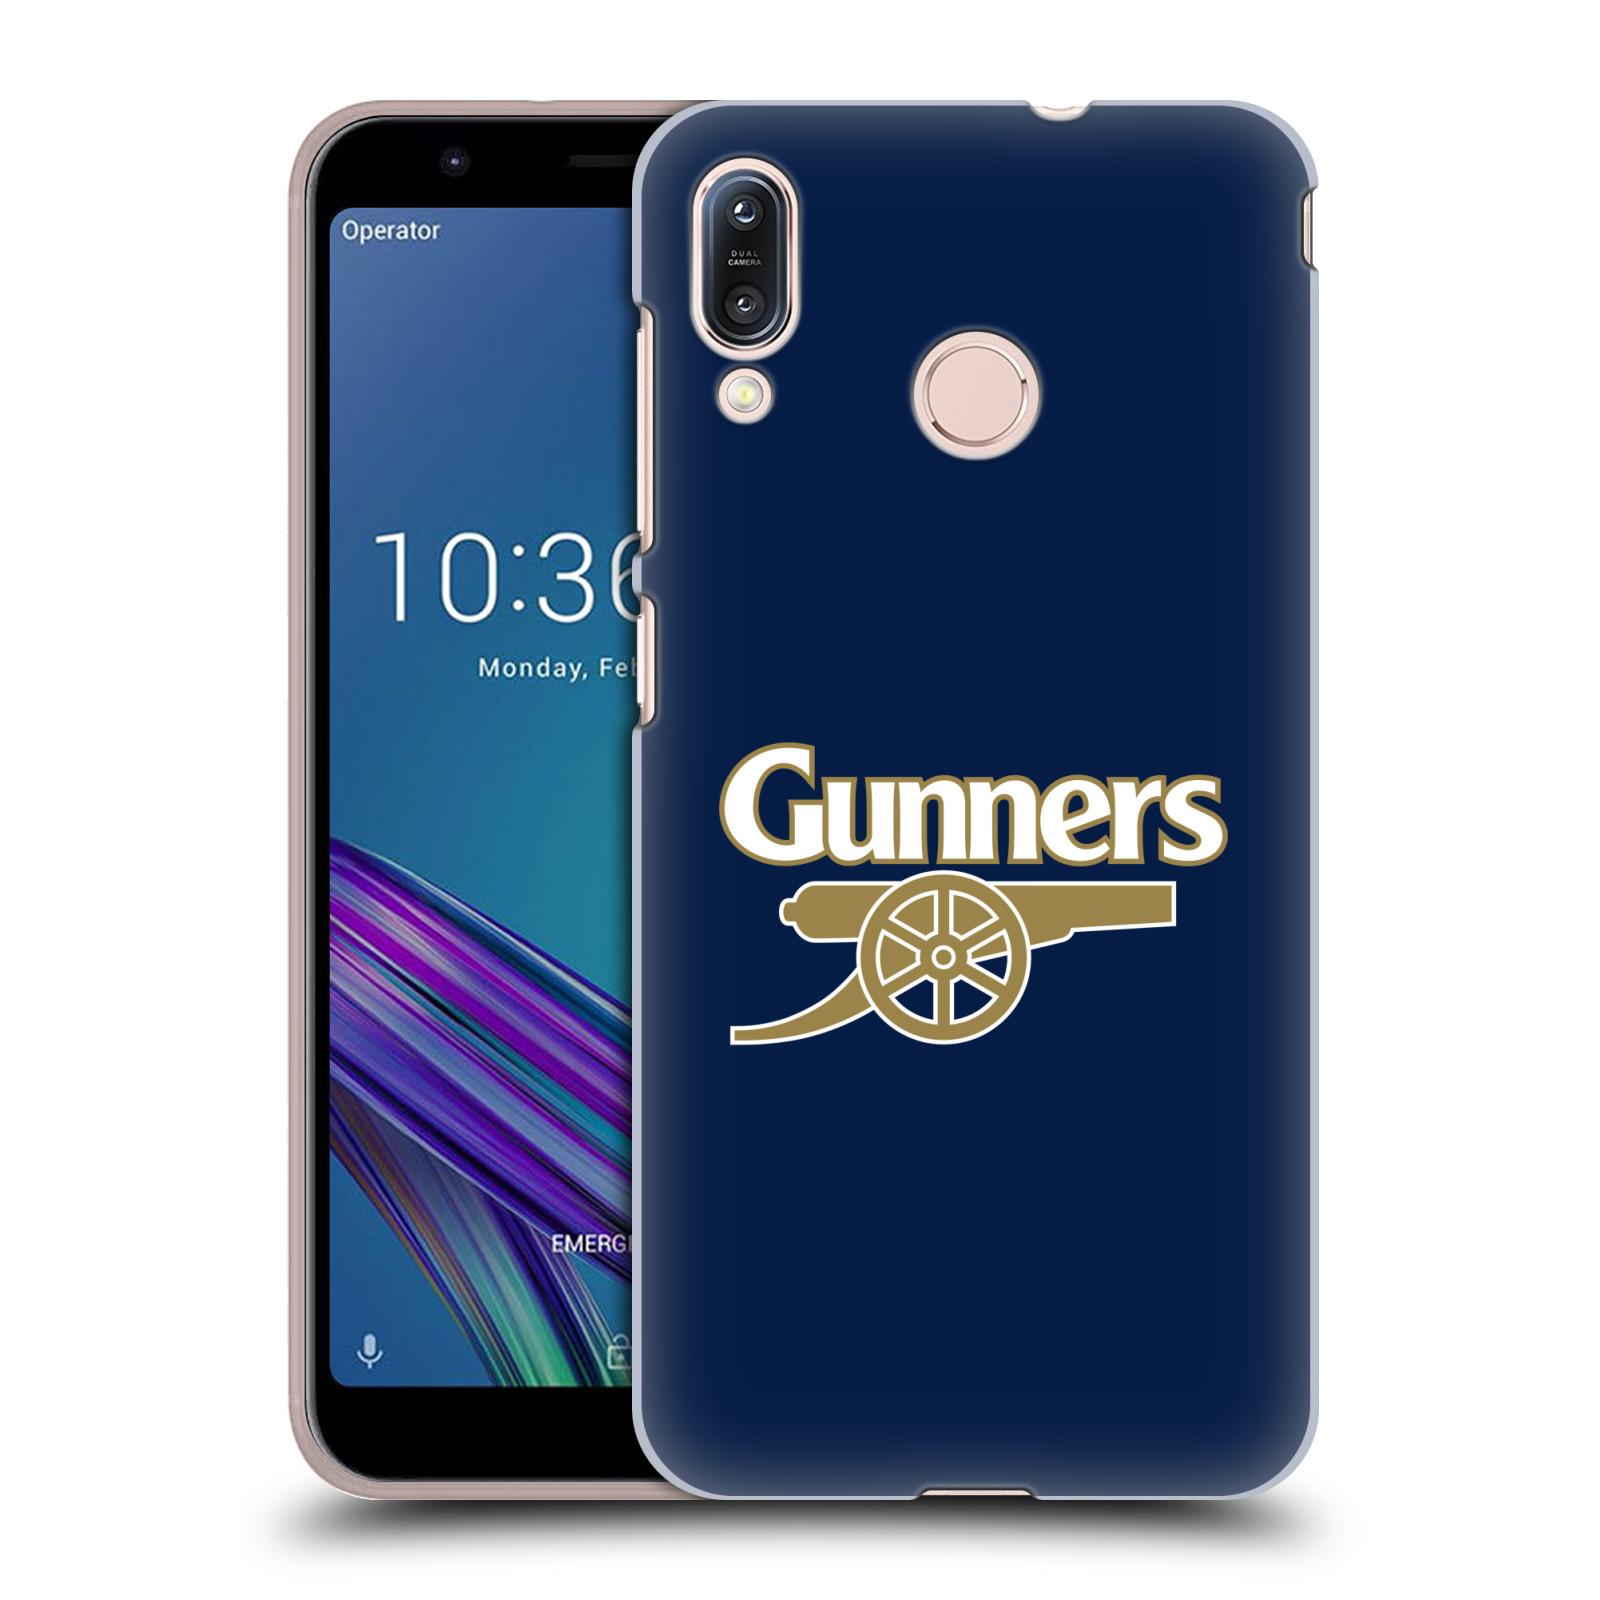 Plastové pouzdro na mobil Asus Zenfone Max M1 ZB555KL - Head Case - Arsenal FC - Gunners